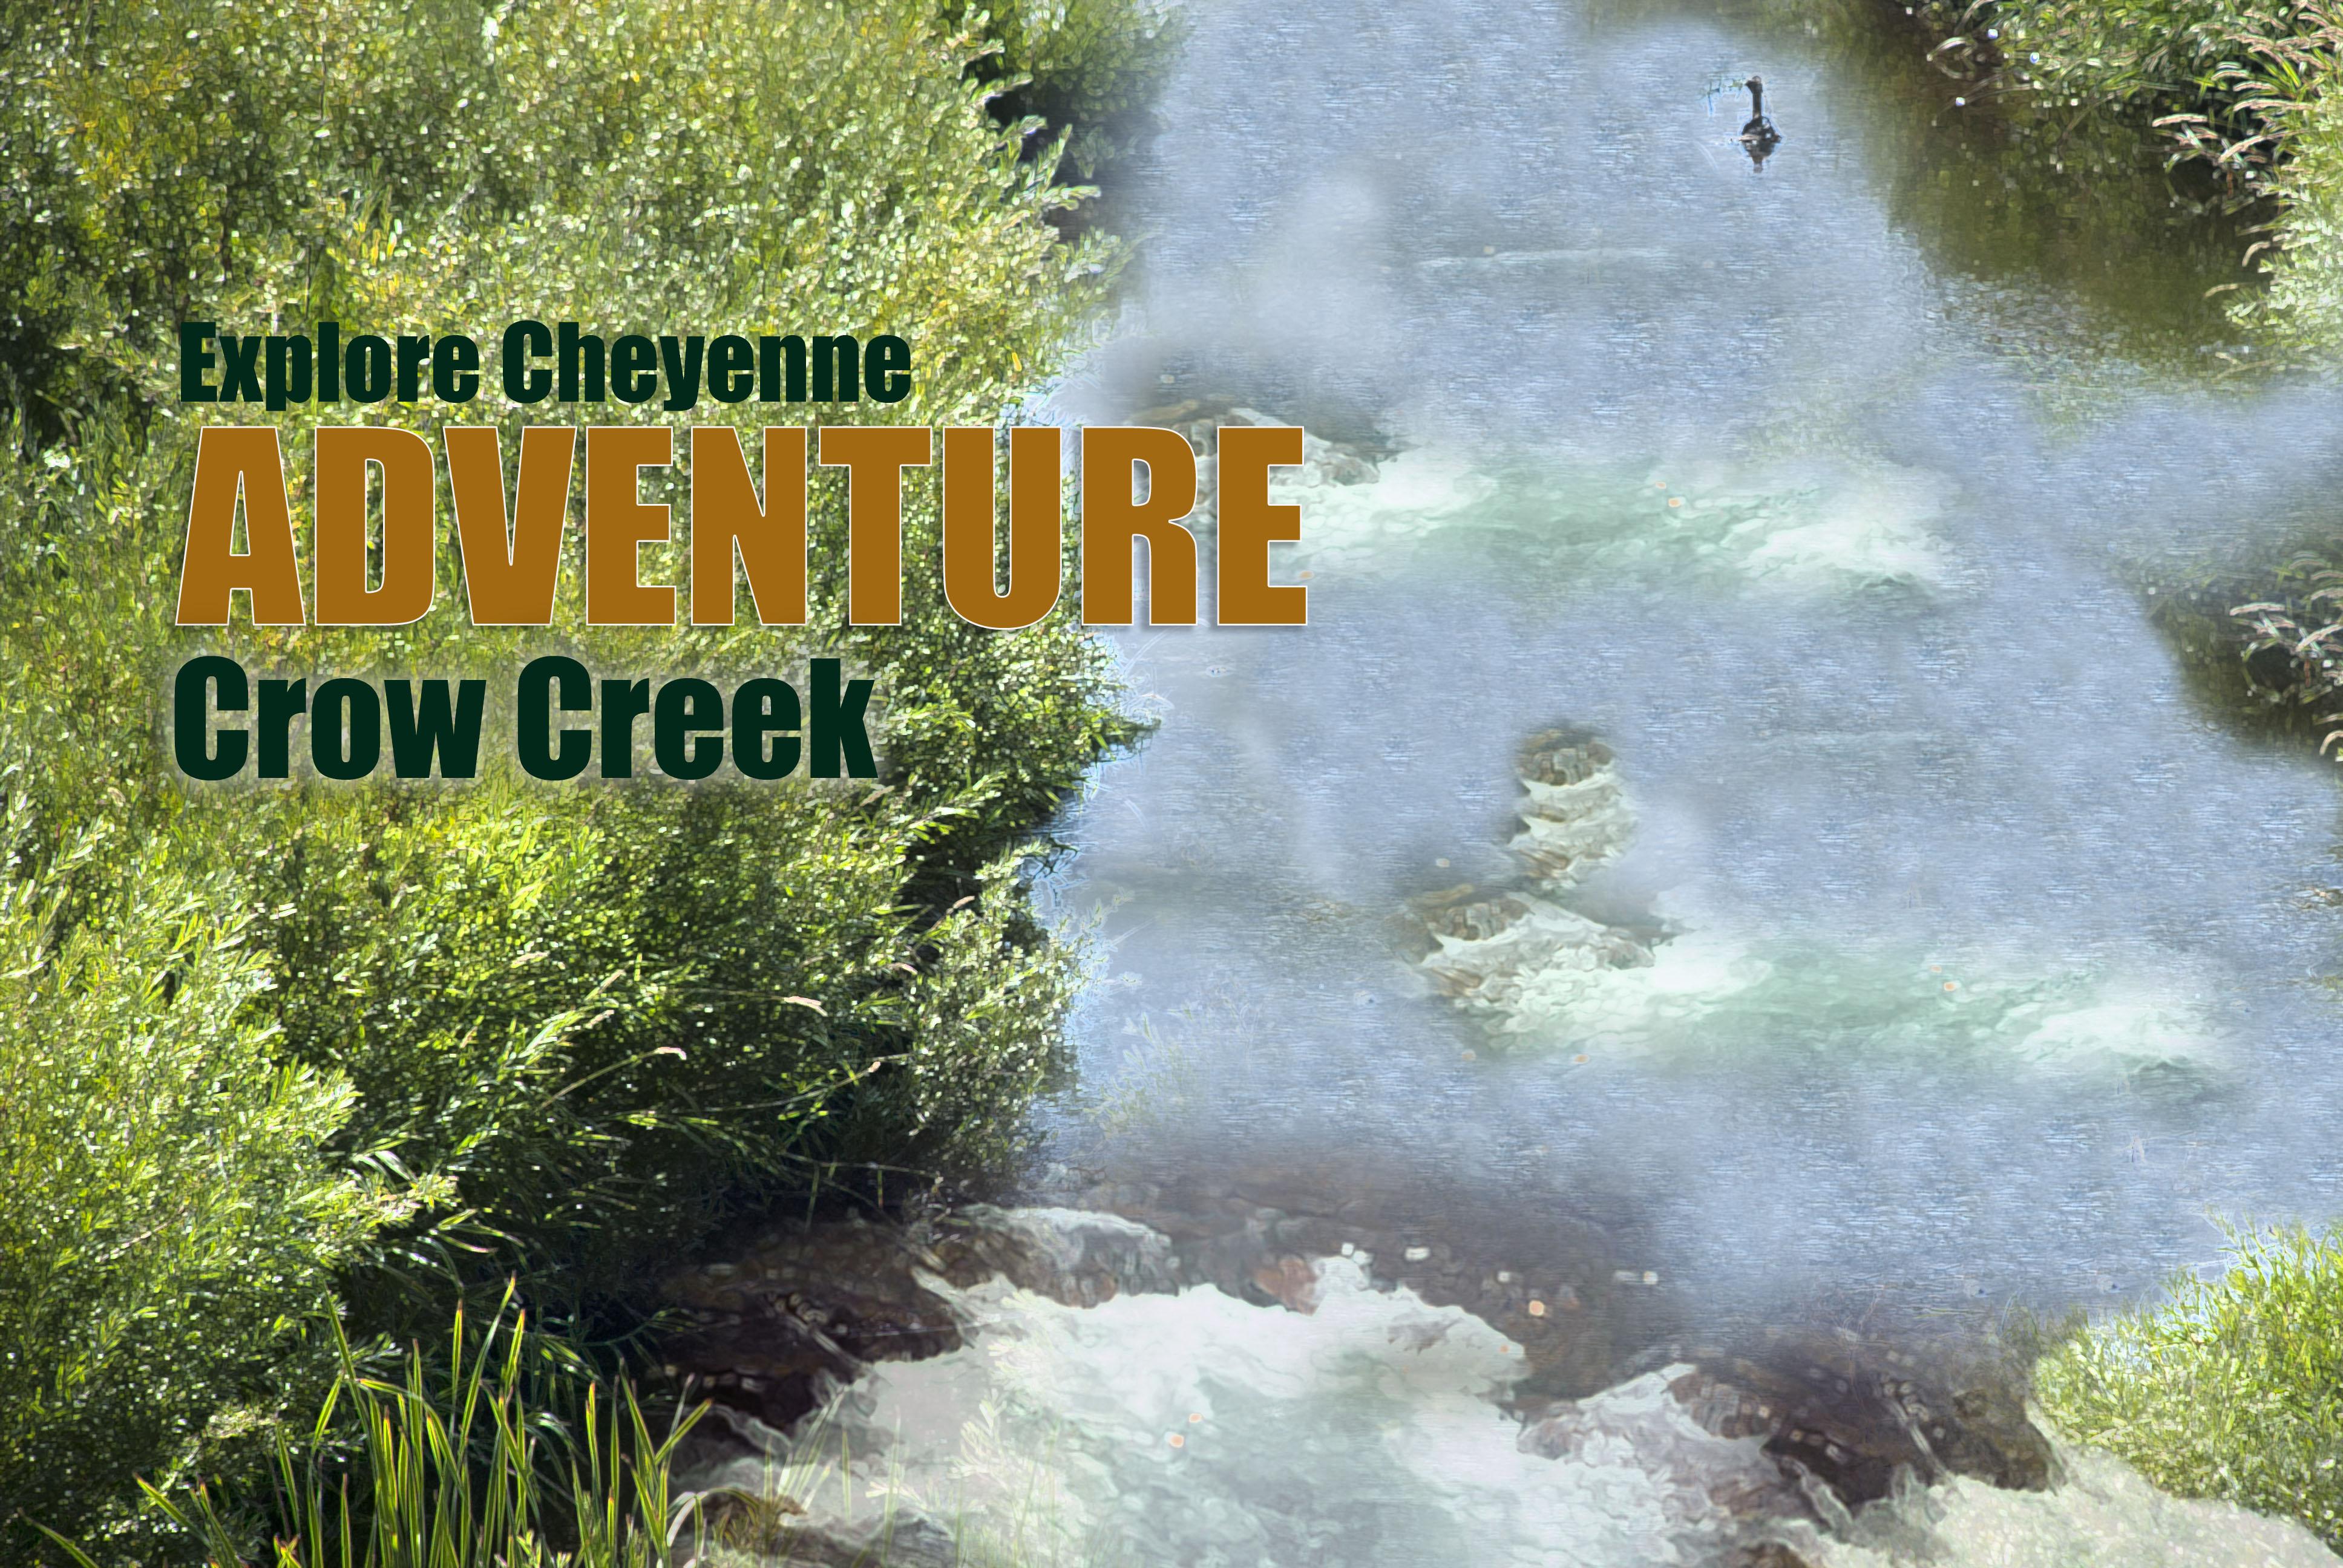 Adventure Crow Creek